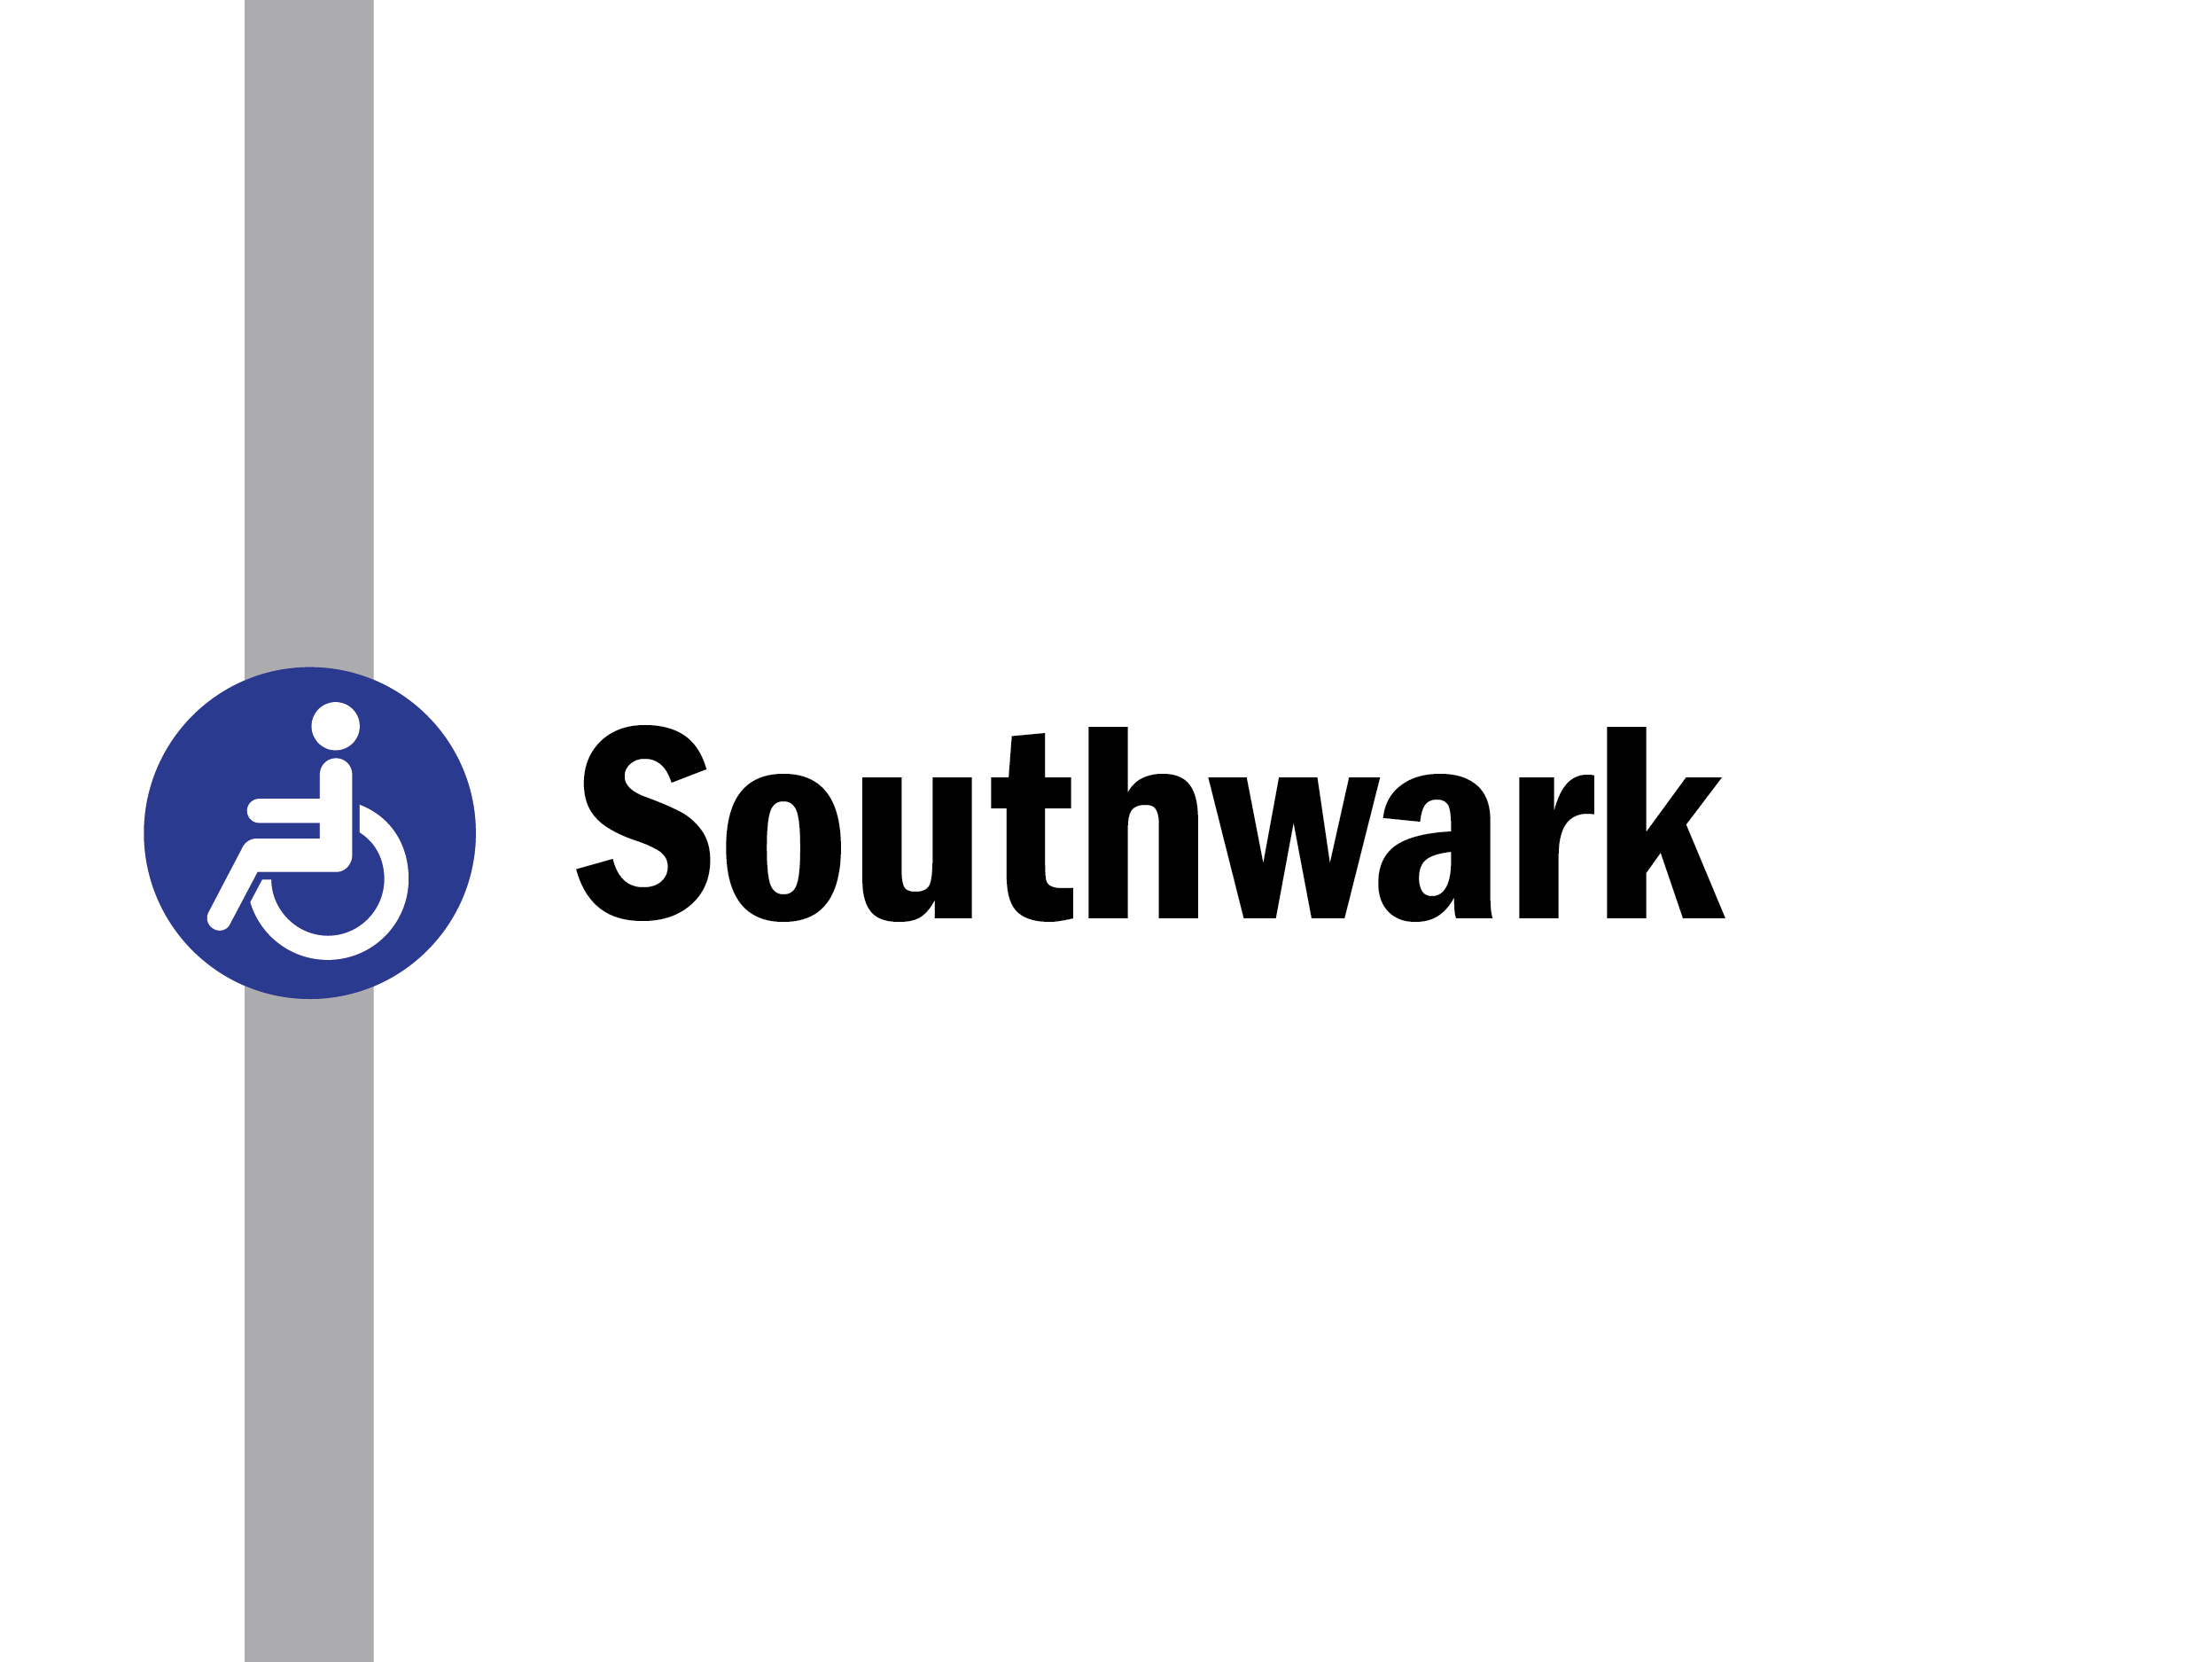 Southwark, night tube